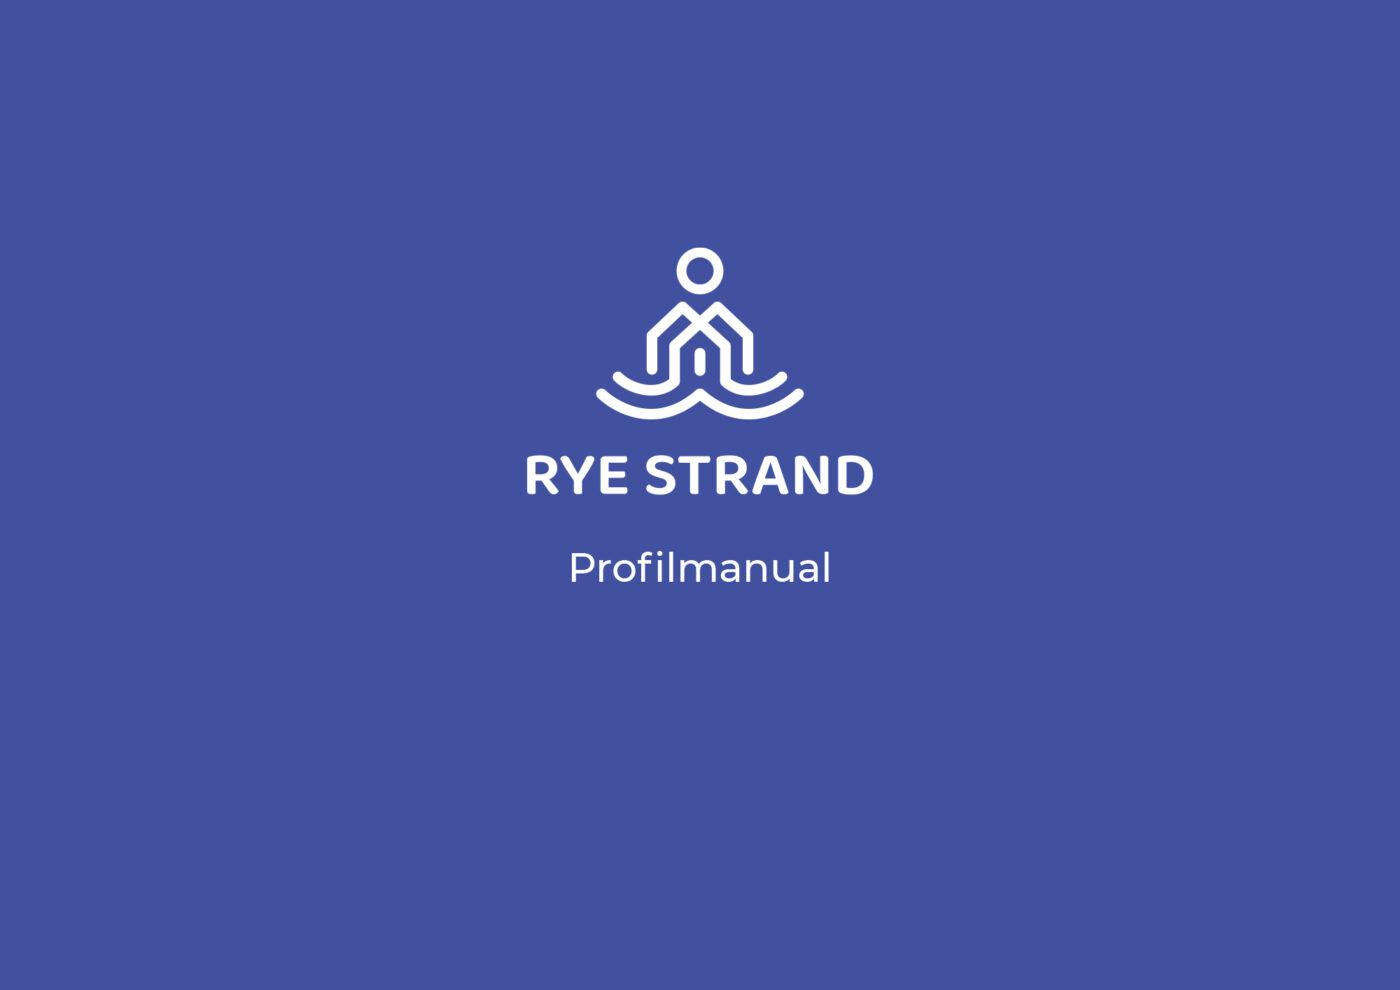 Doghouse: Rye Strand - Profilmanual